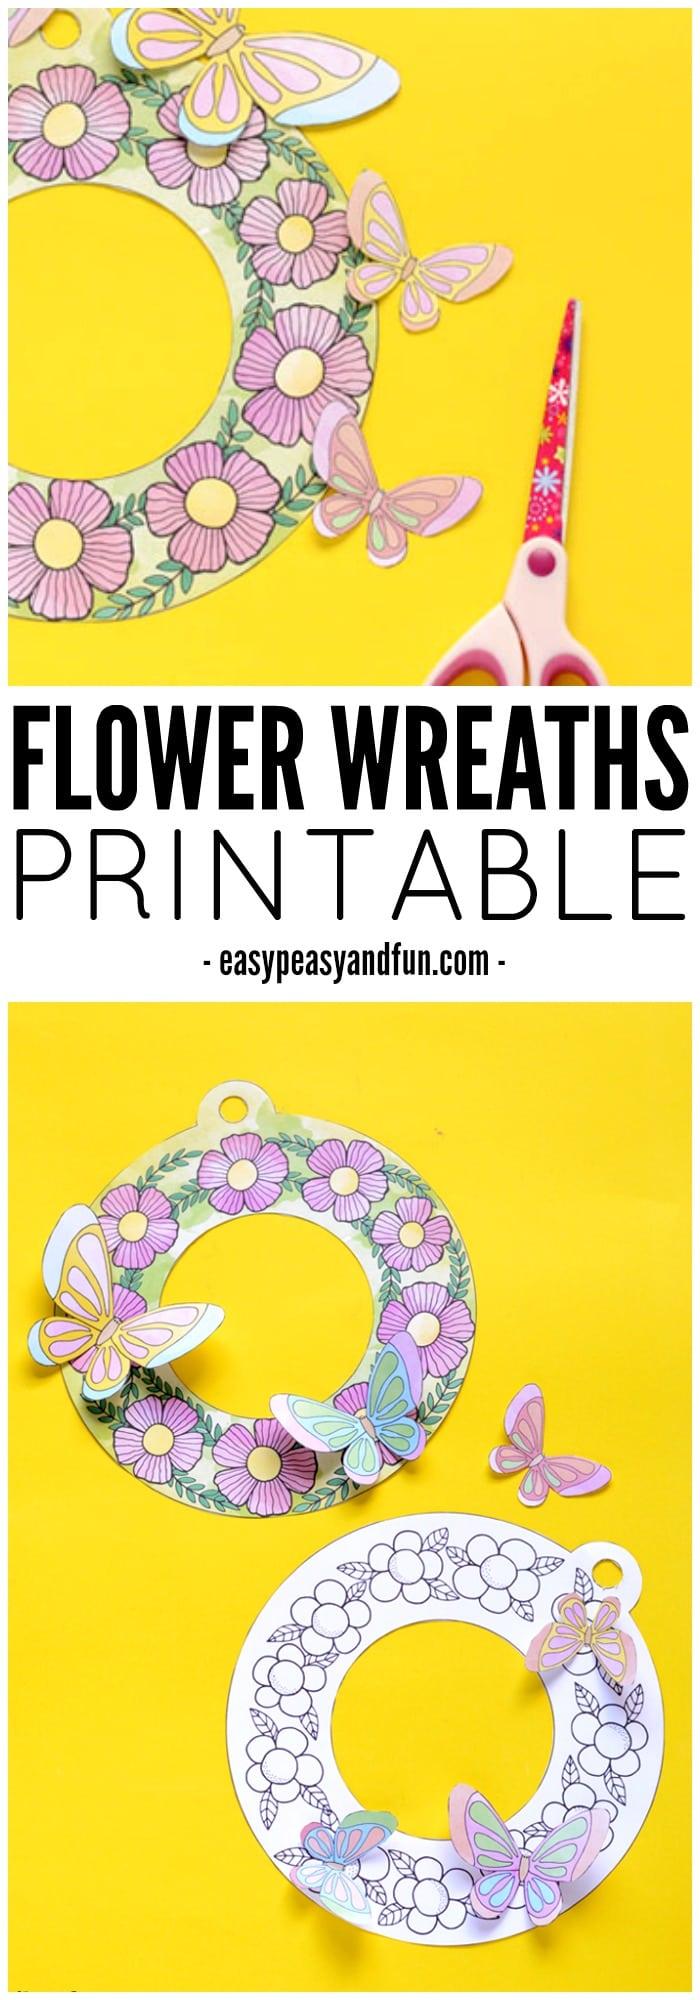 Gorgeous Printable Flower Wreaths